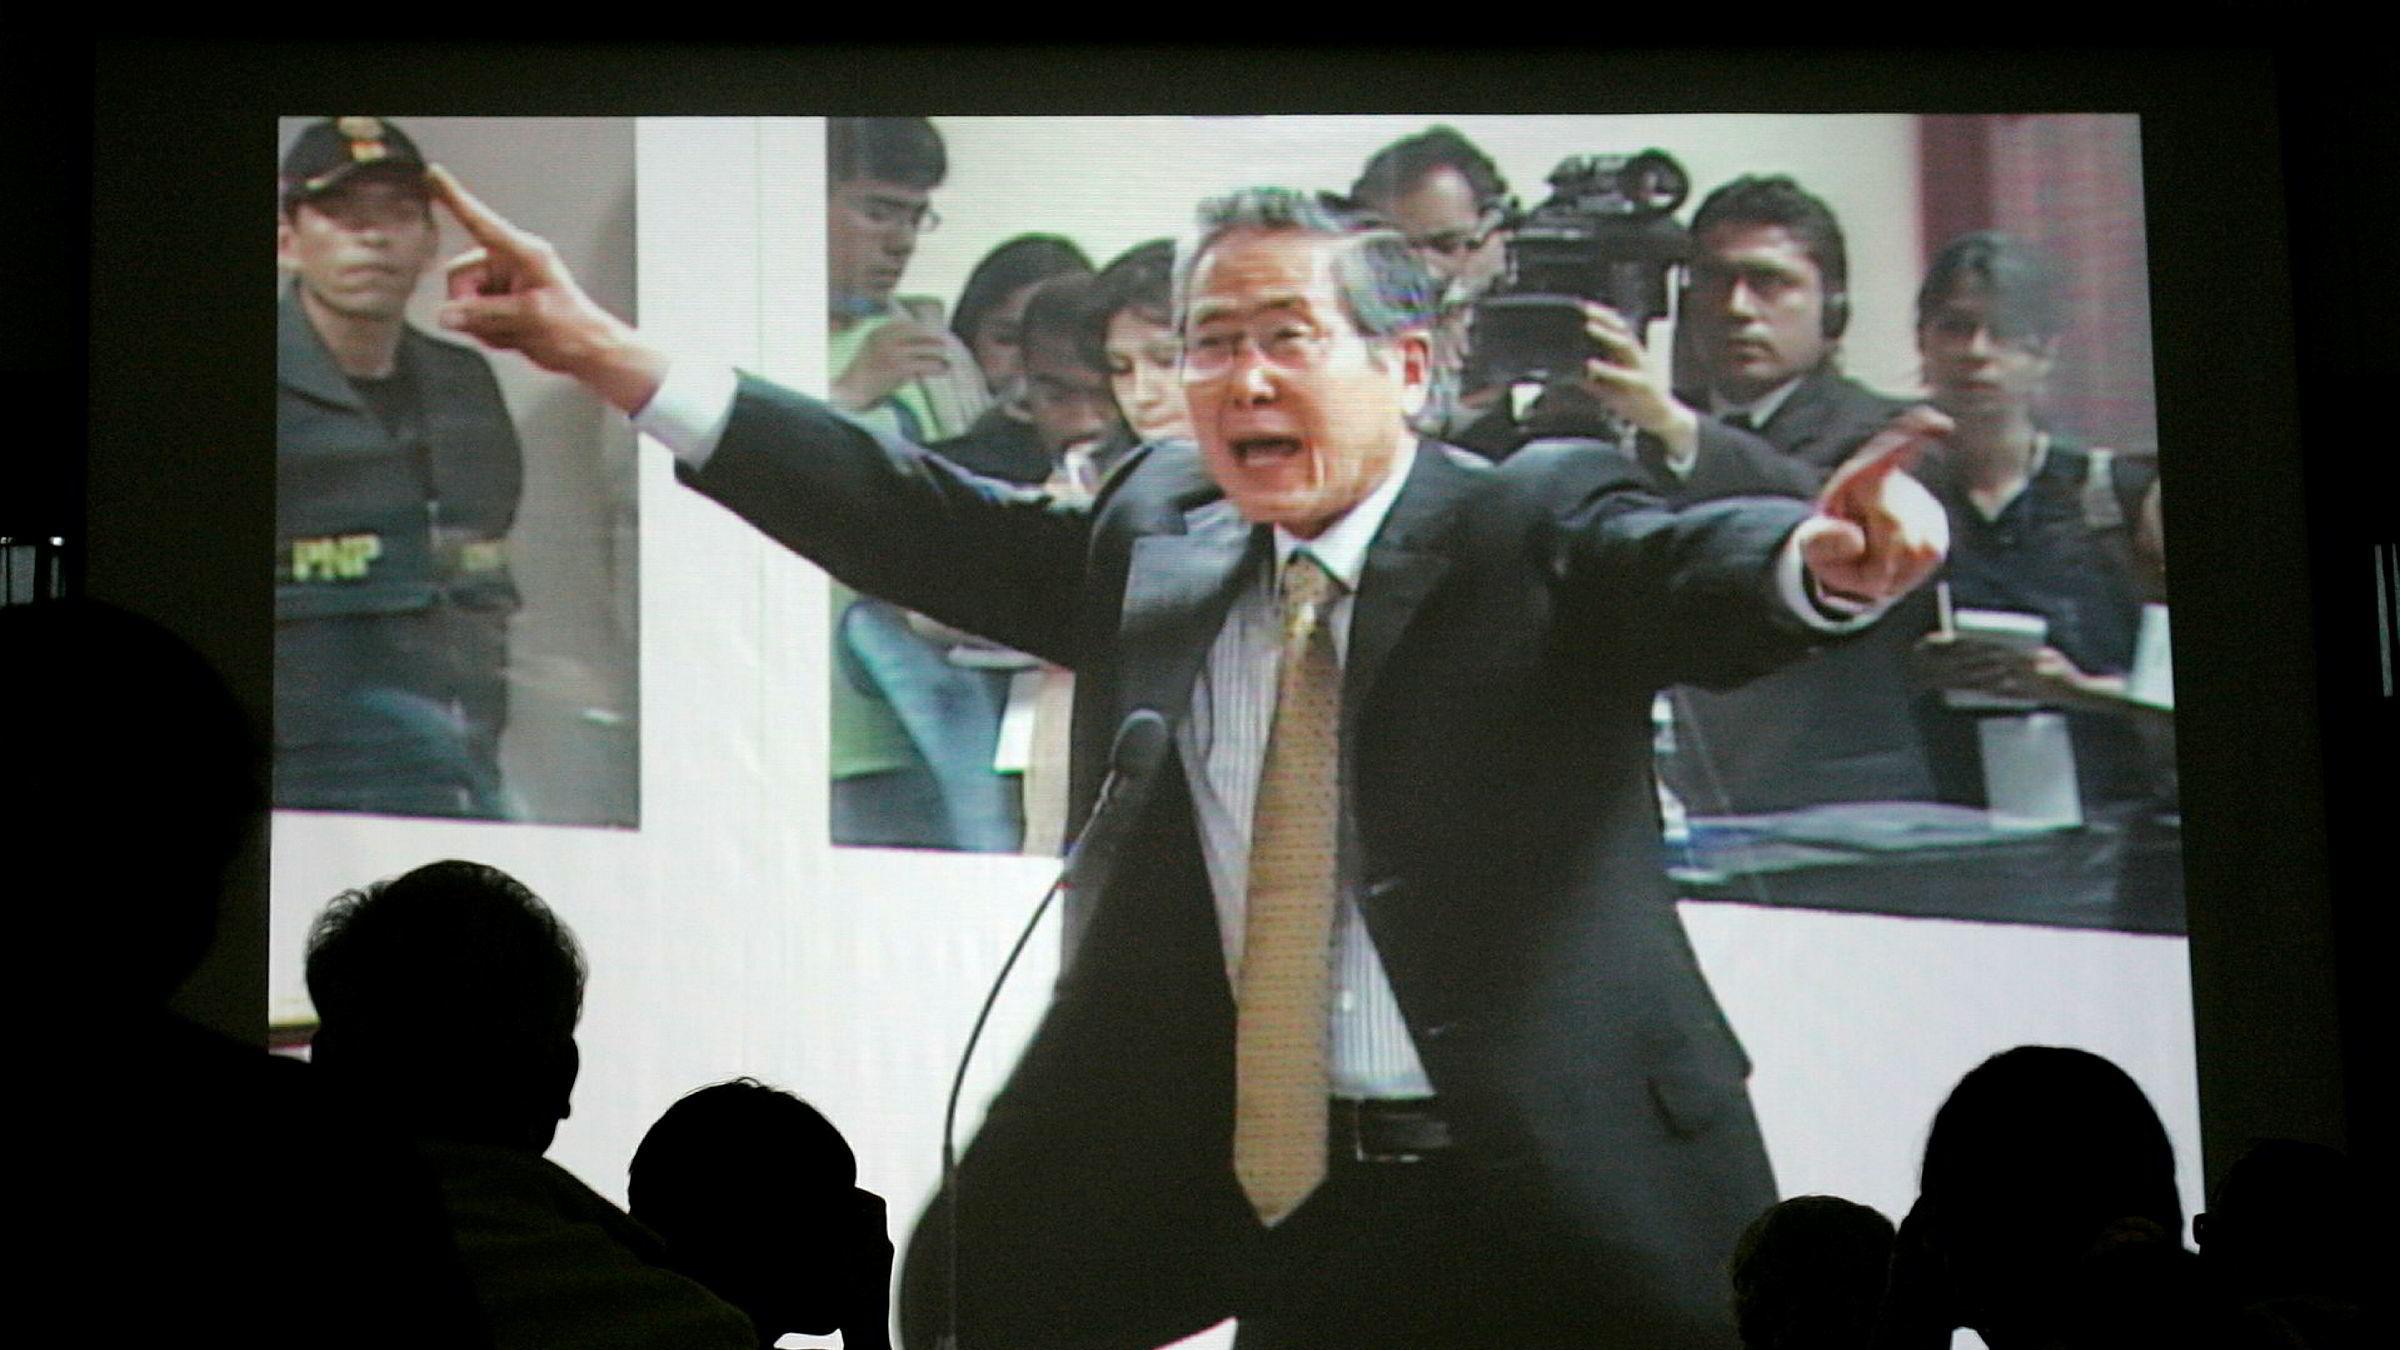 Arkivfoto fra rettssaken mot Alberto Fujimori, som nå benådes av helsemessige årsaker. Foto: Martin Mejia / AP / NTB scanpix